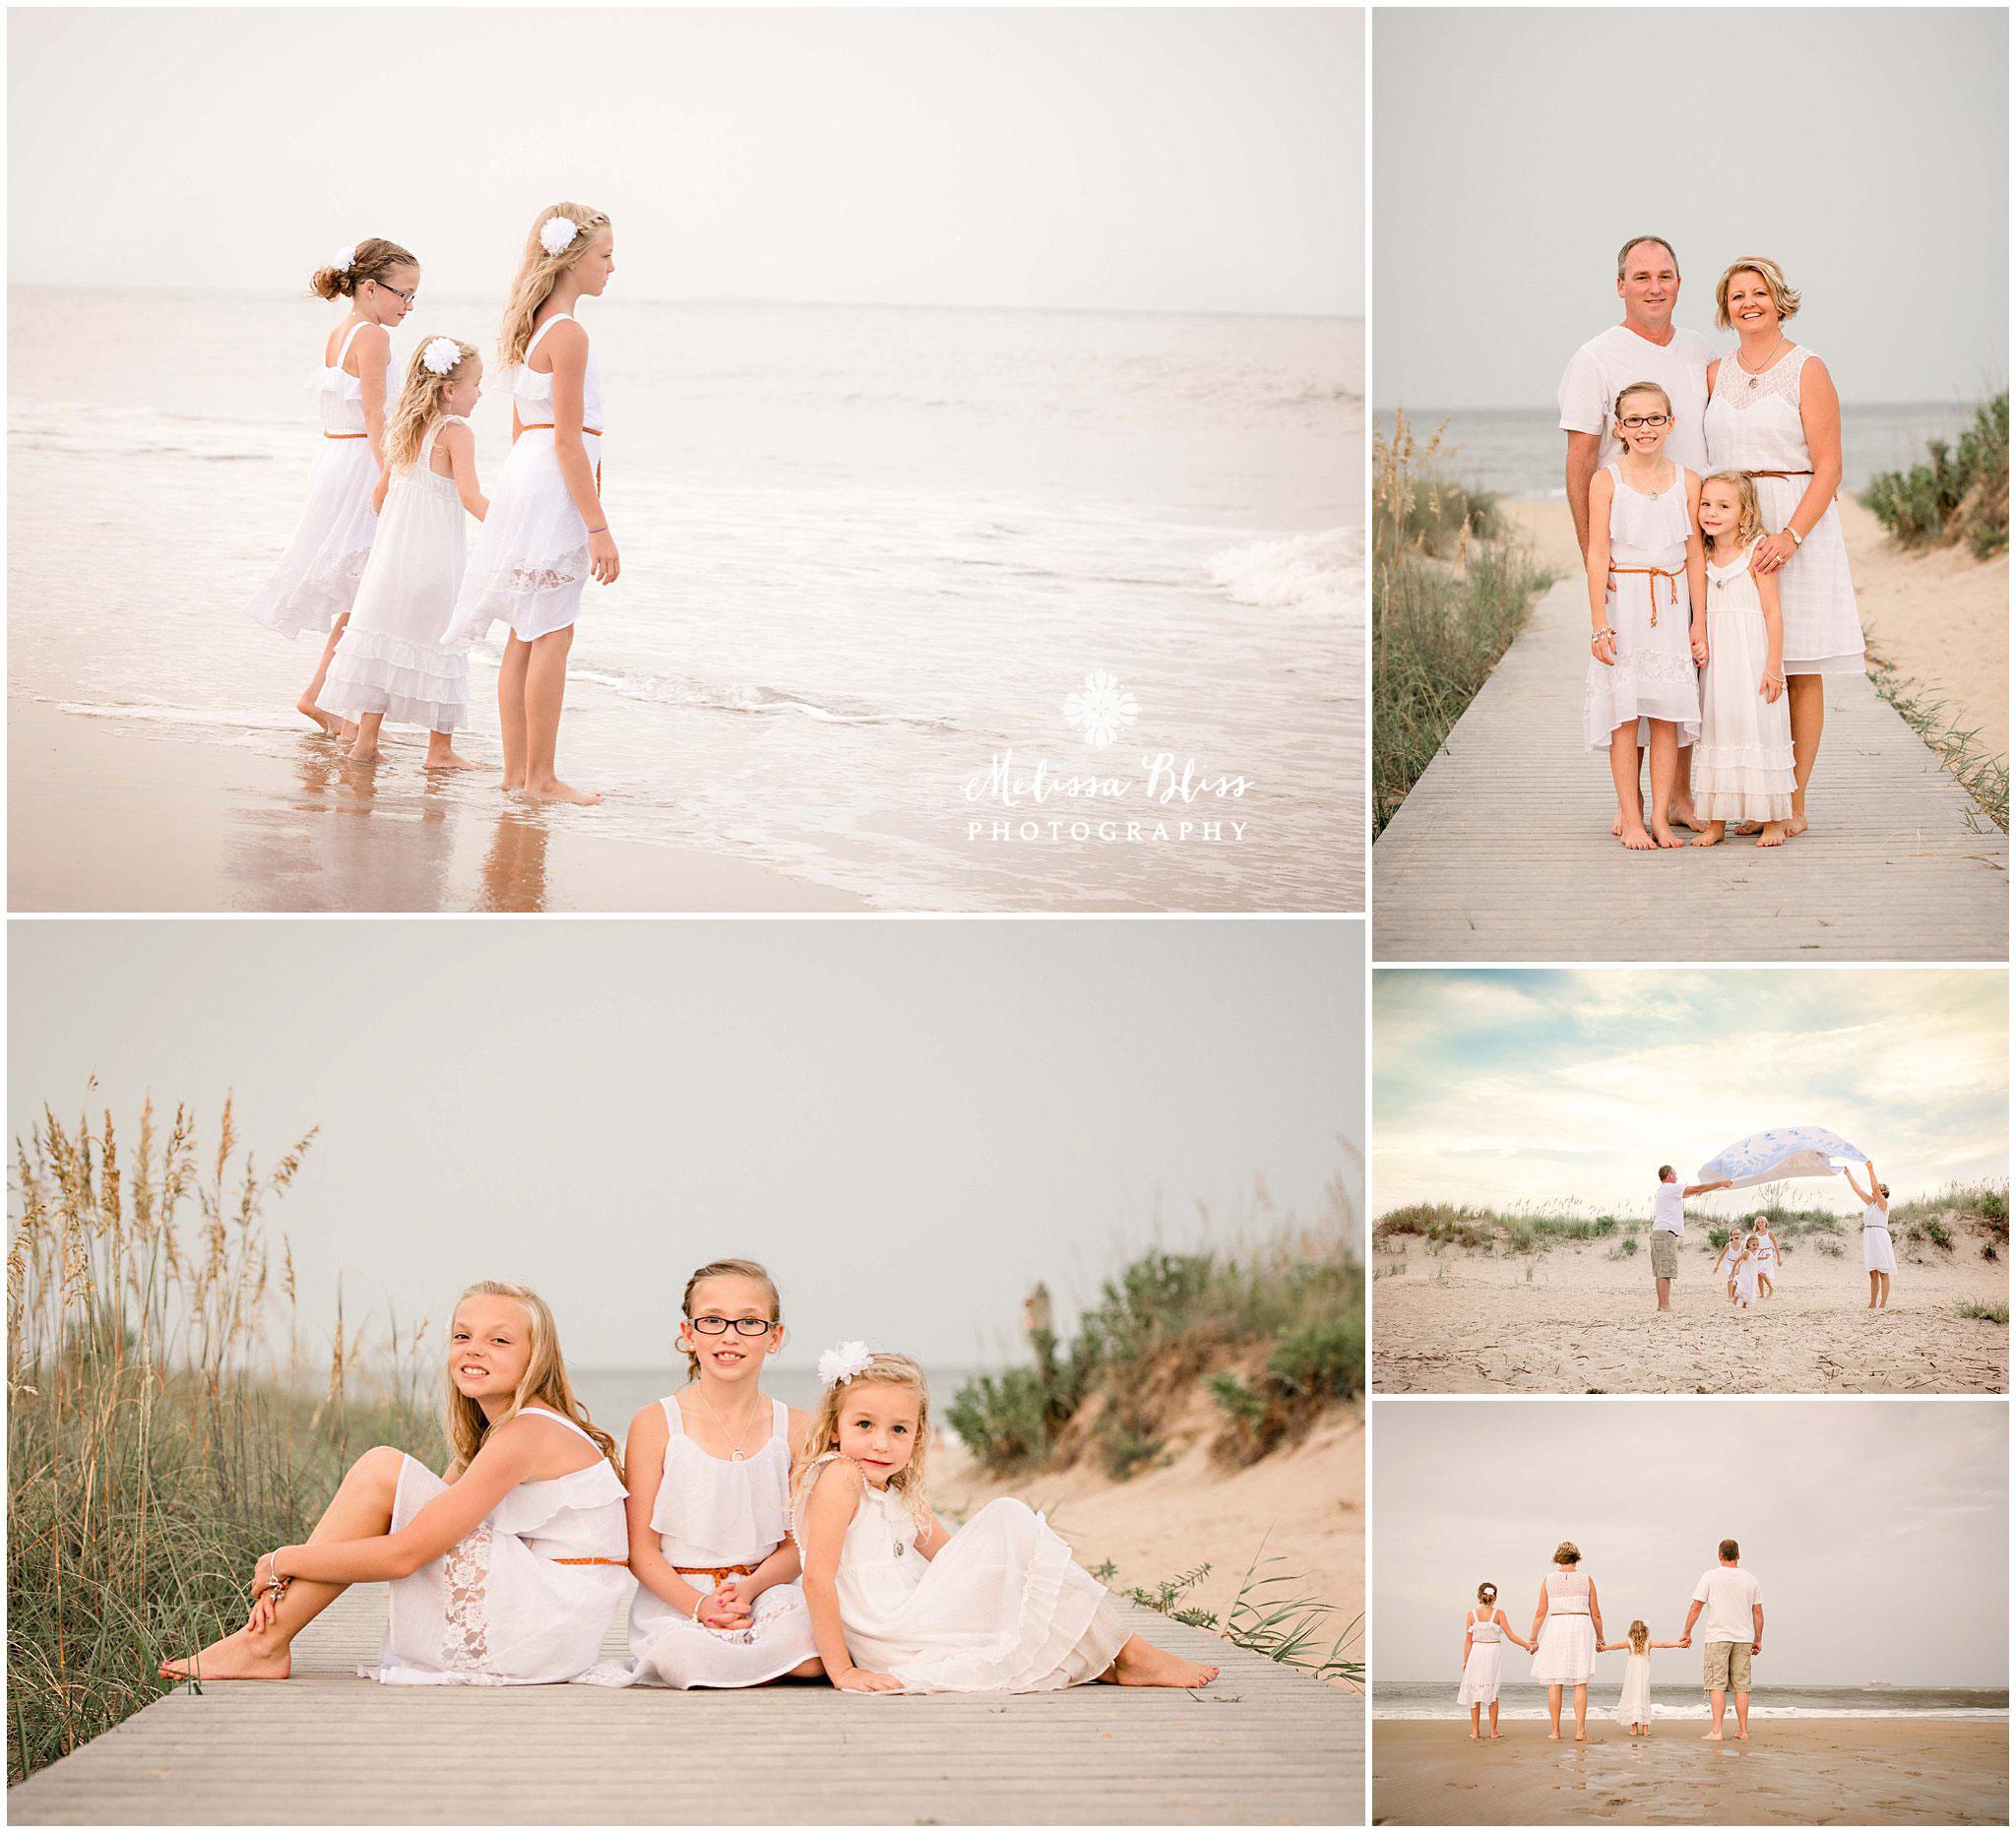 sandbridge-photographer-virginia-beach-photographer-melissa-bliss-photography-norfolk-va-beach